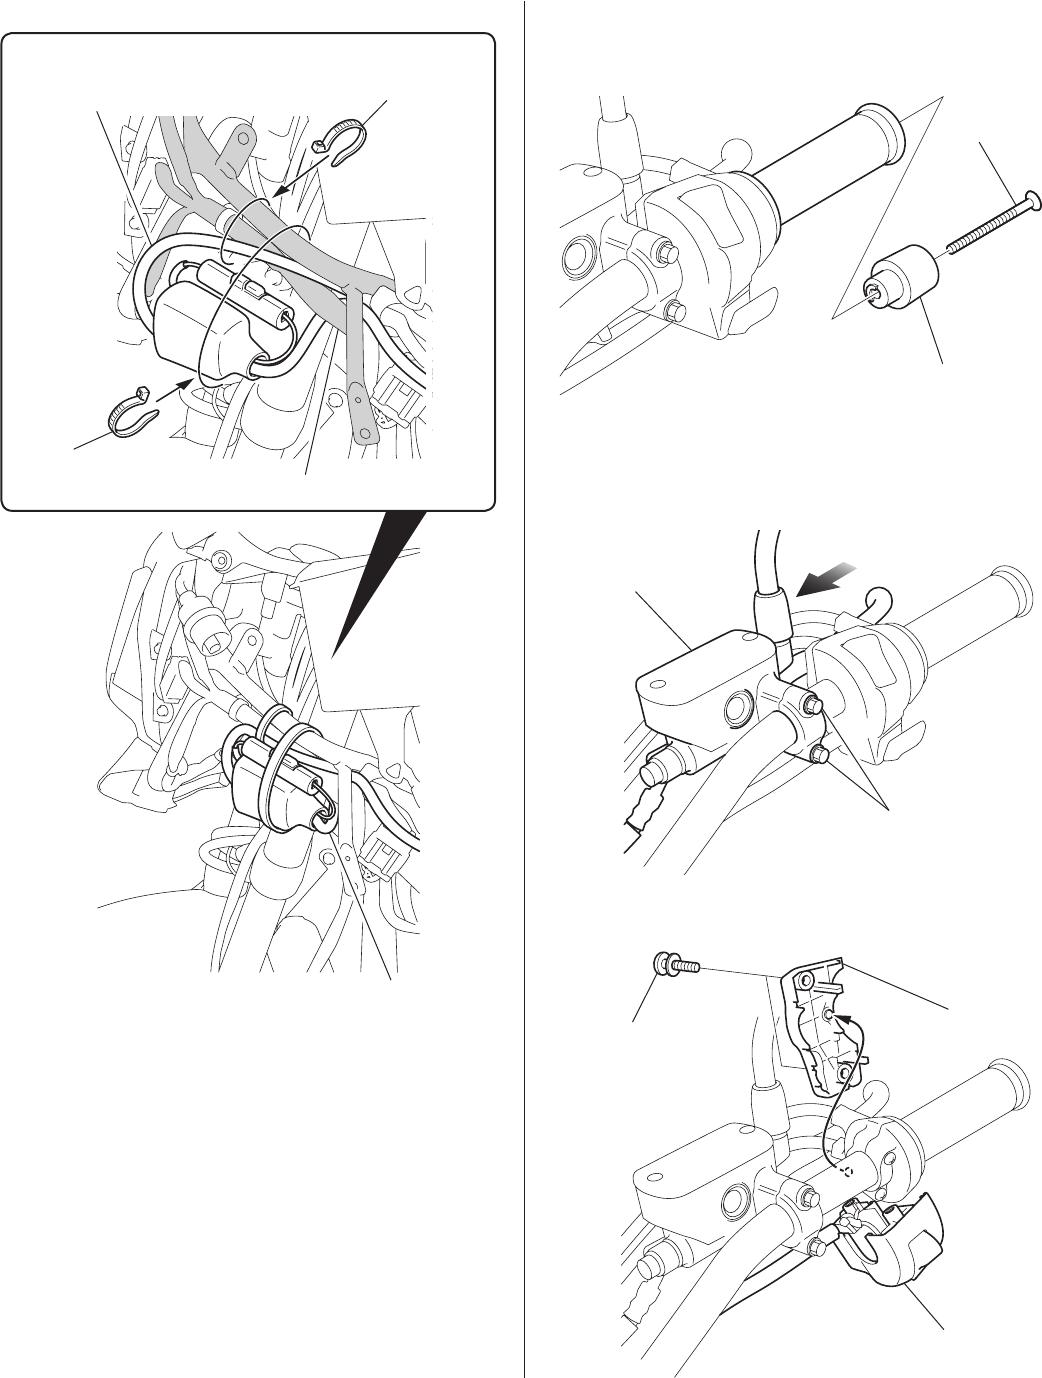 Nc700x Fuse Box Wiring Diagram Database Ke175 Handleiding Honda Nc 700x Heated Grips Pagina 10 Van 15 English Switch 2012